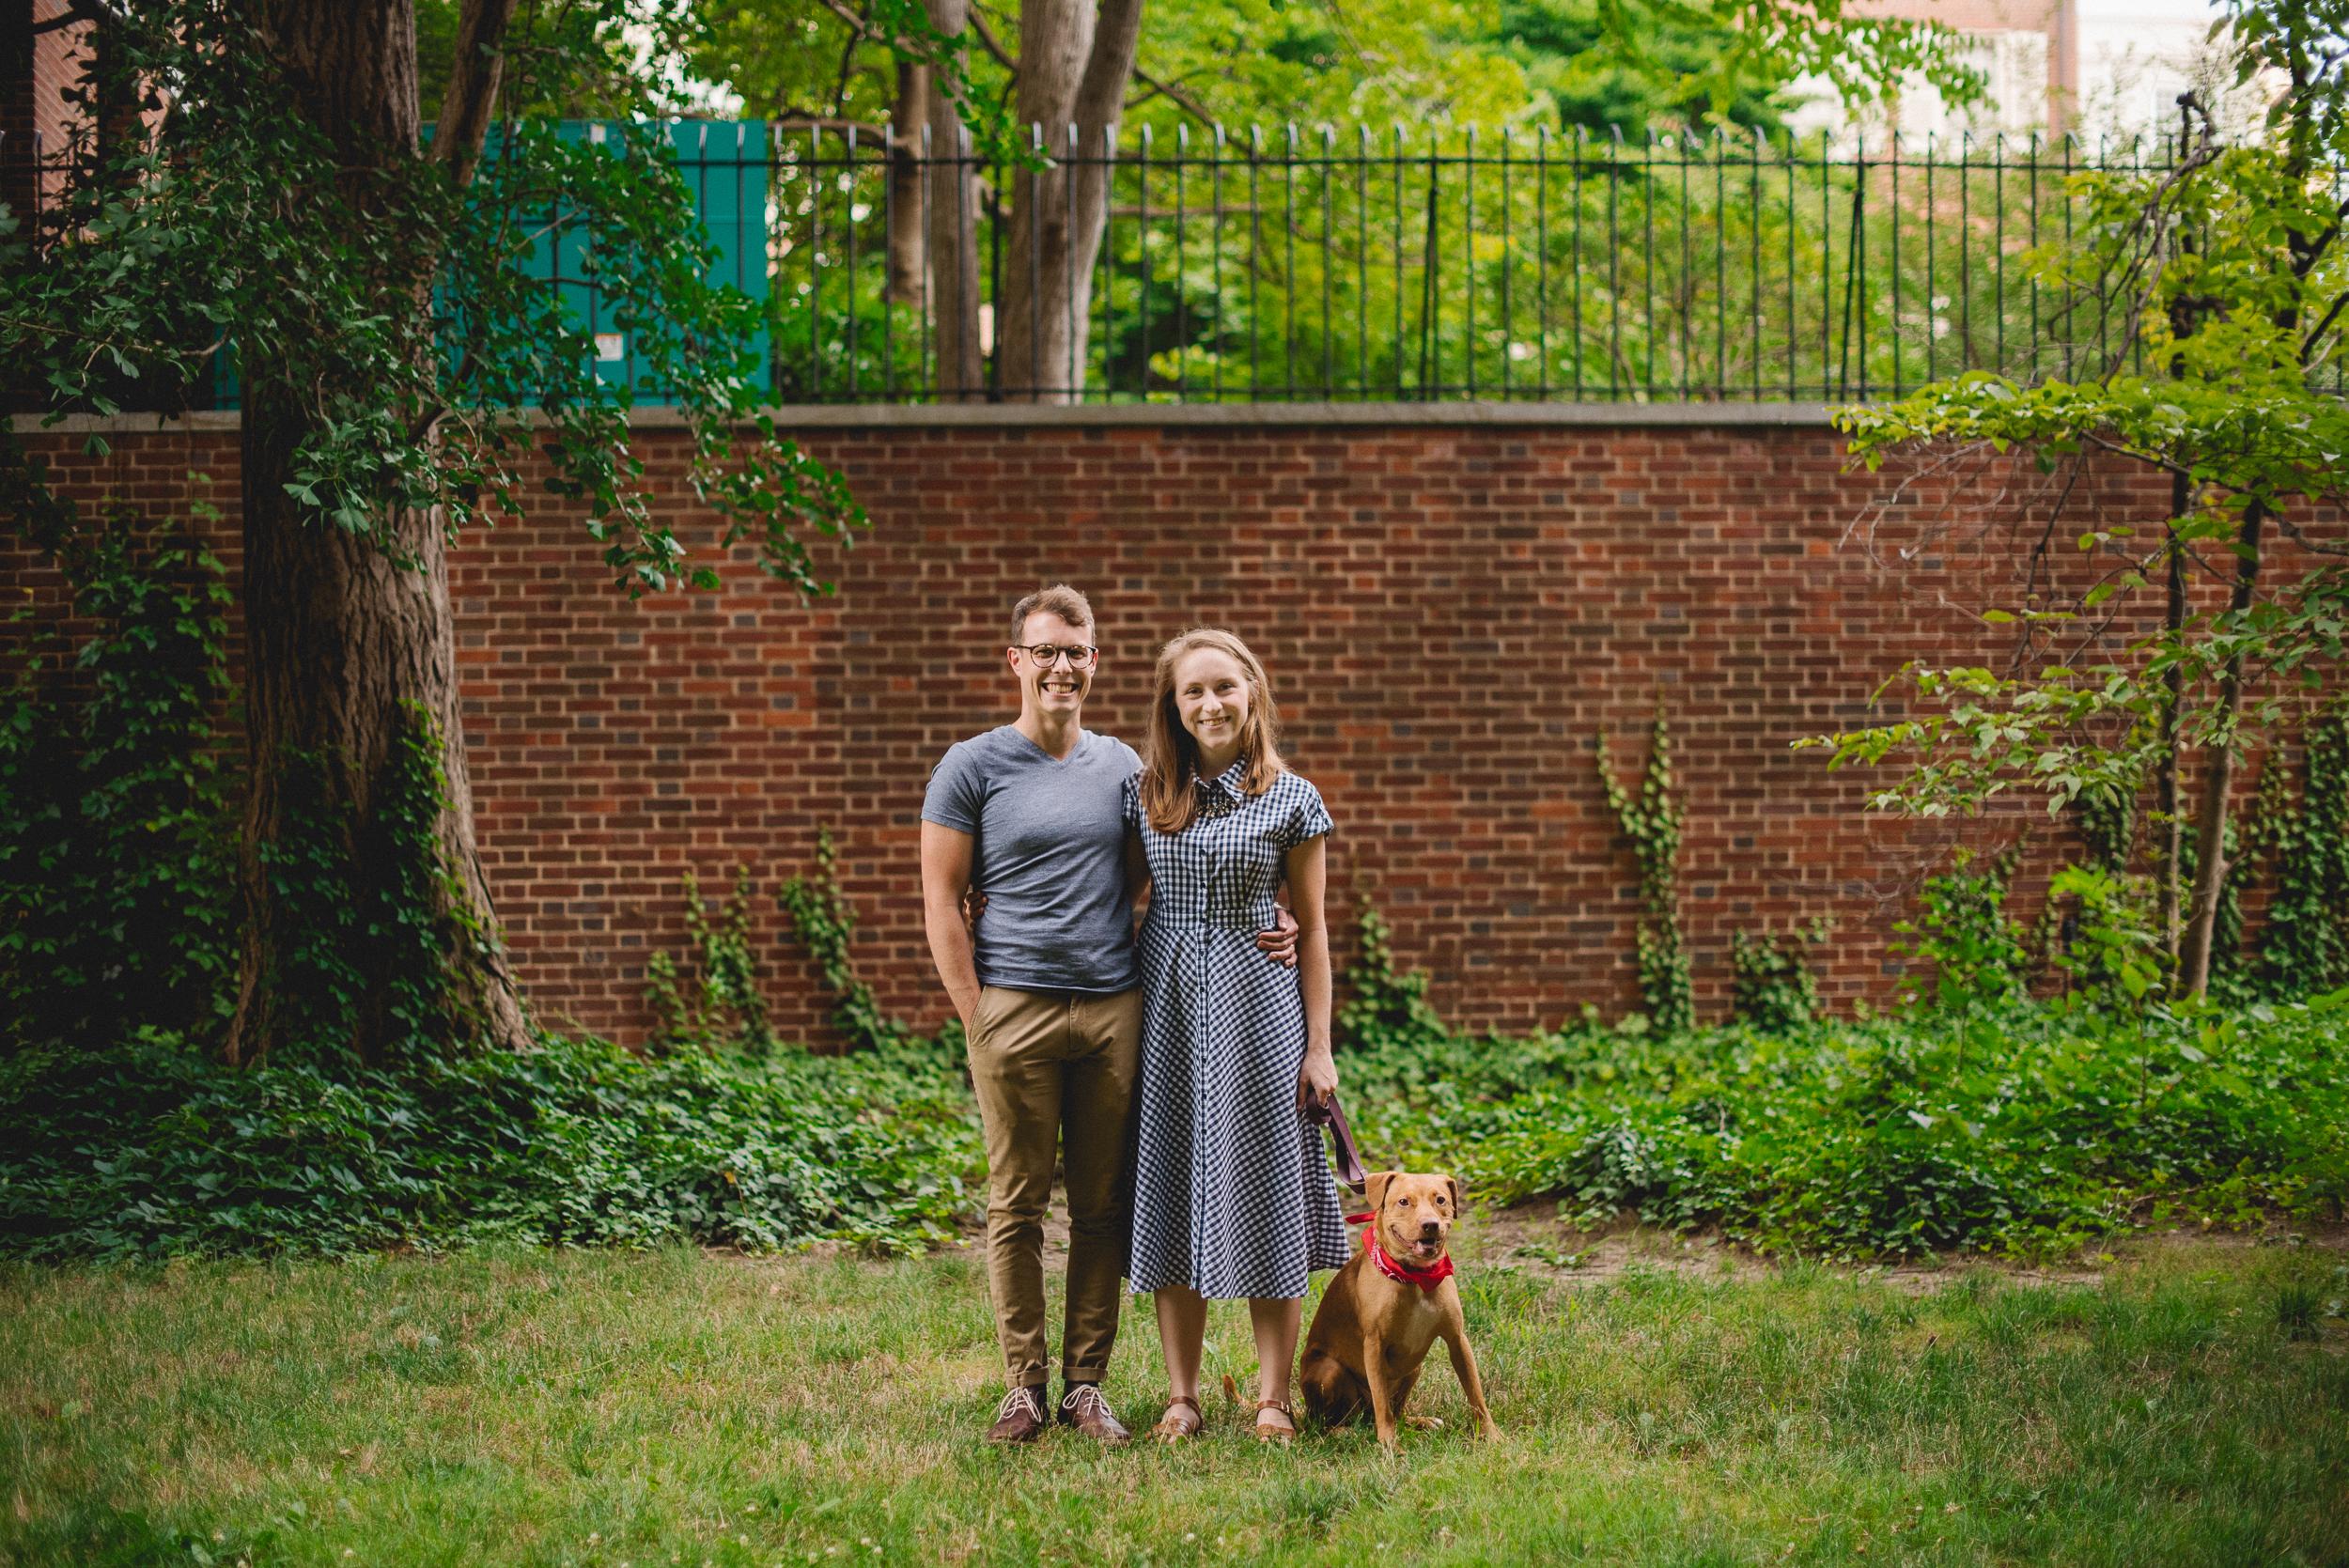 Peaberry-Photography-Society-Hill-Philadelphia-Pennsylvania-Newlyweds-Just-Married-001.jpg